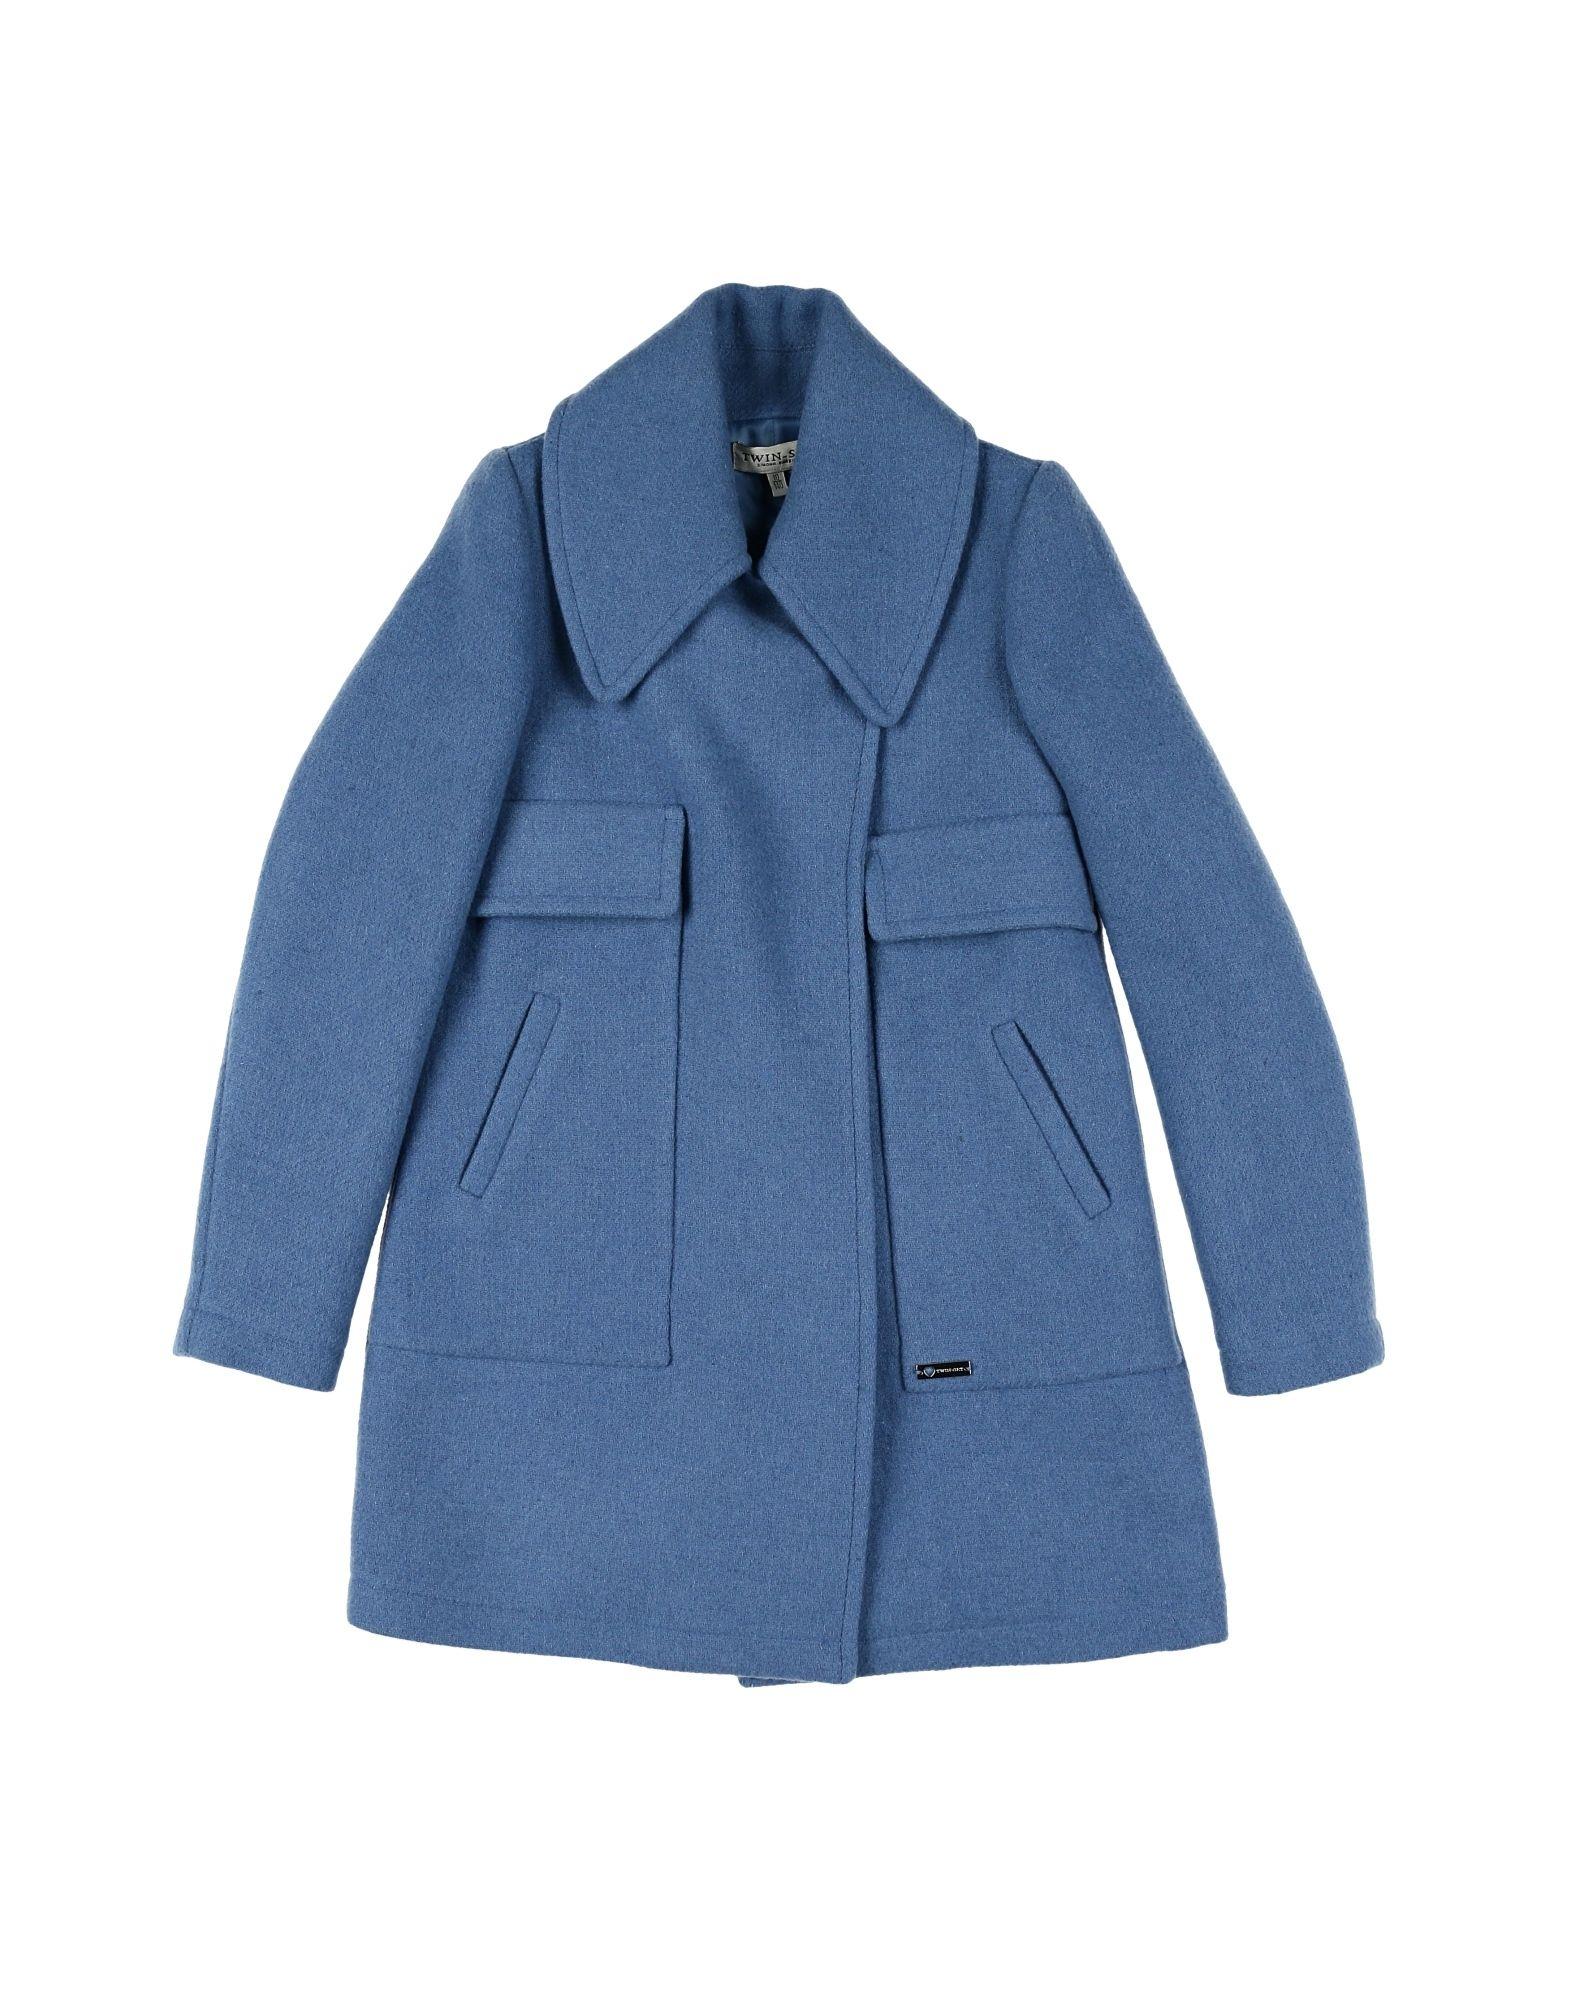 TWIN-SET Simona Barbieri Mädchen 9-16 jahre Mantel Farbe Blau Größe 6